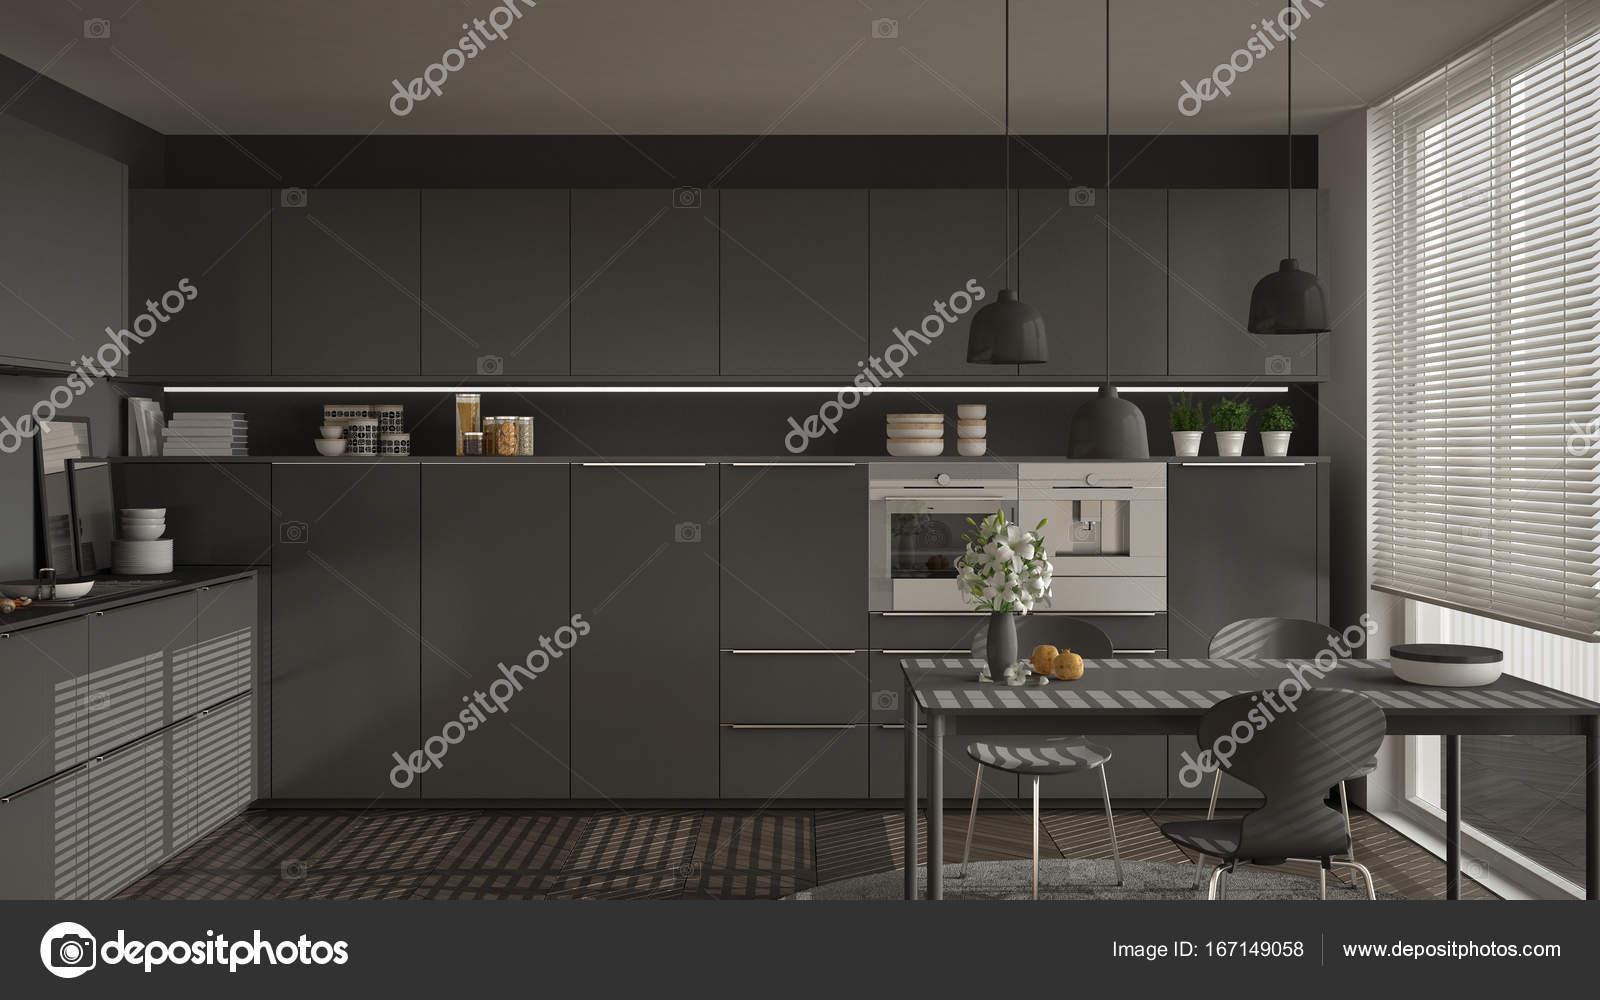 modern kitchen table vintage posters for 现代厨房的桌子和椅子 大窗户和herringbon 图库照片 c archiviz 167149058